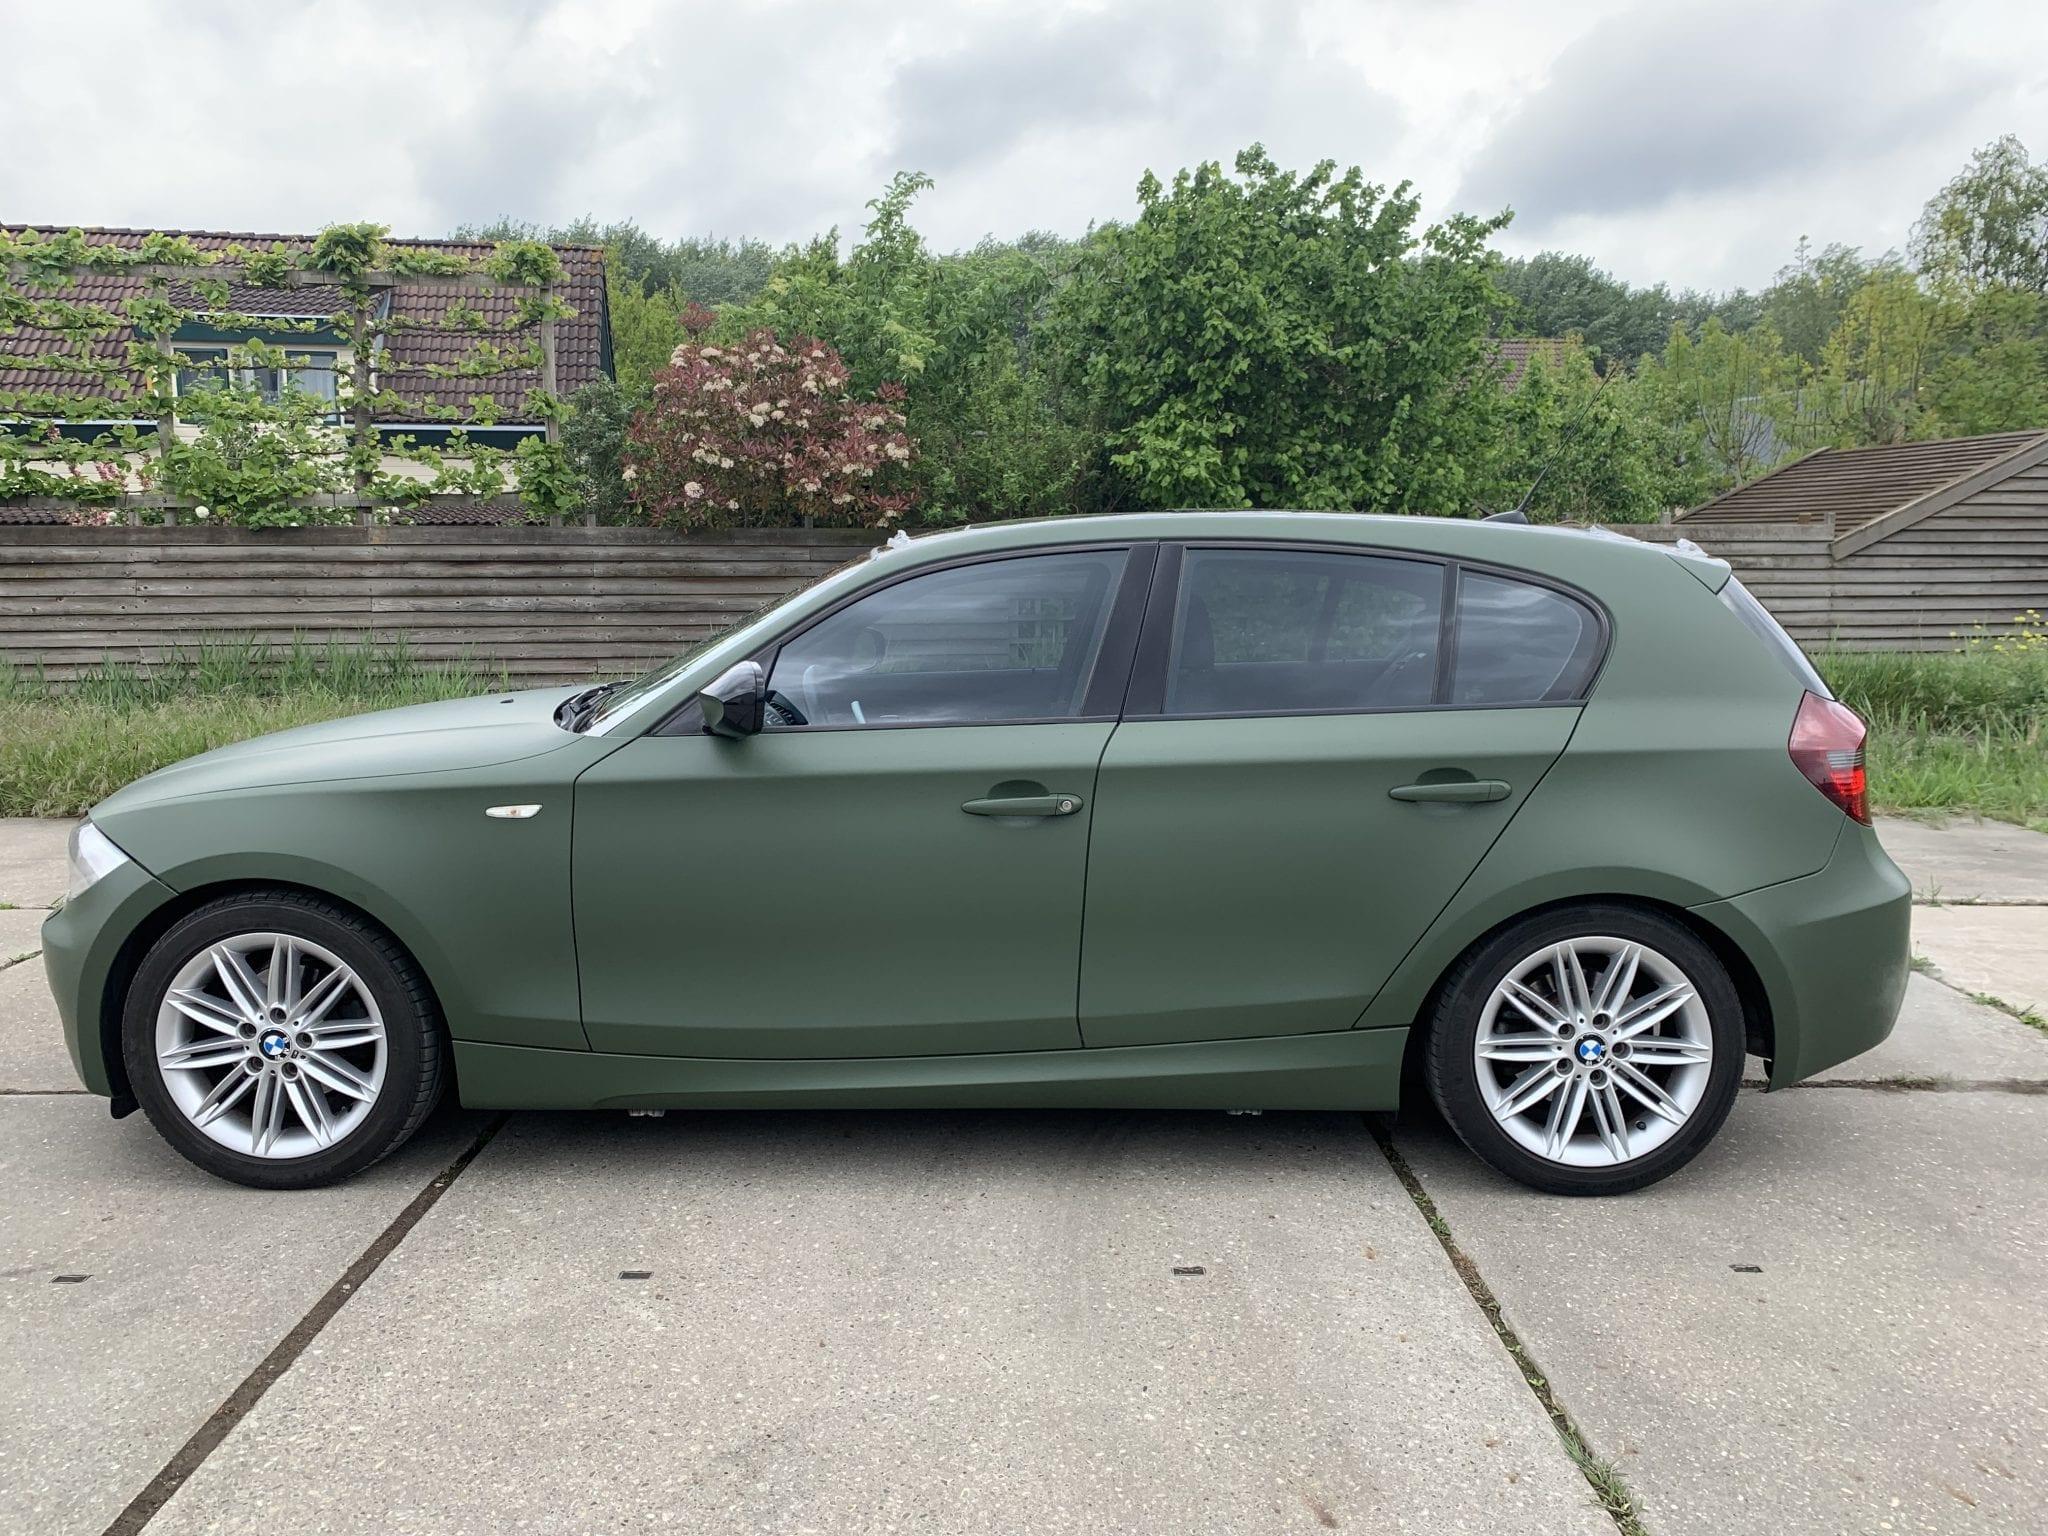 Groene BMW Carwrap | Trim-Line Zevenbergen